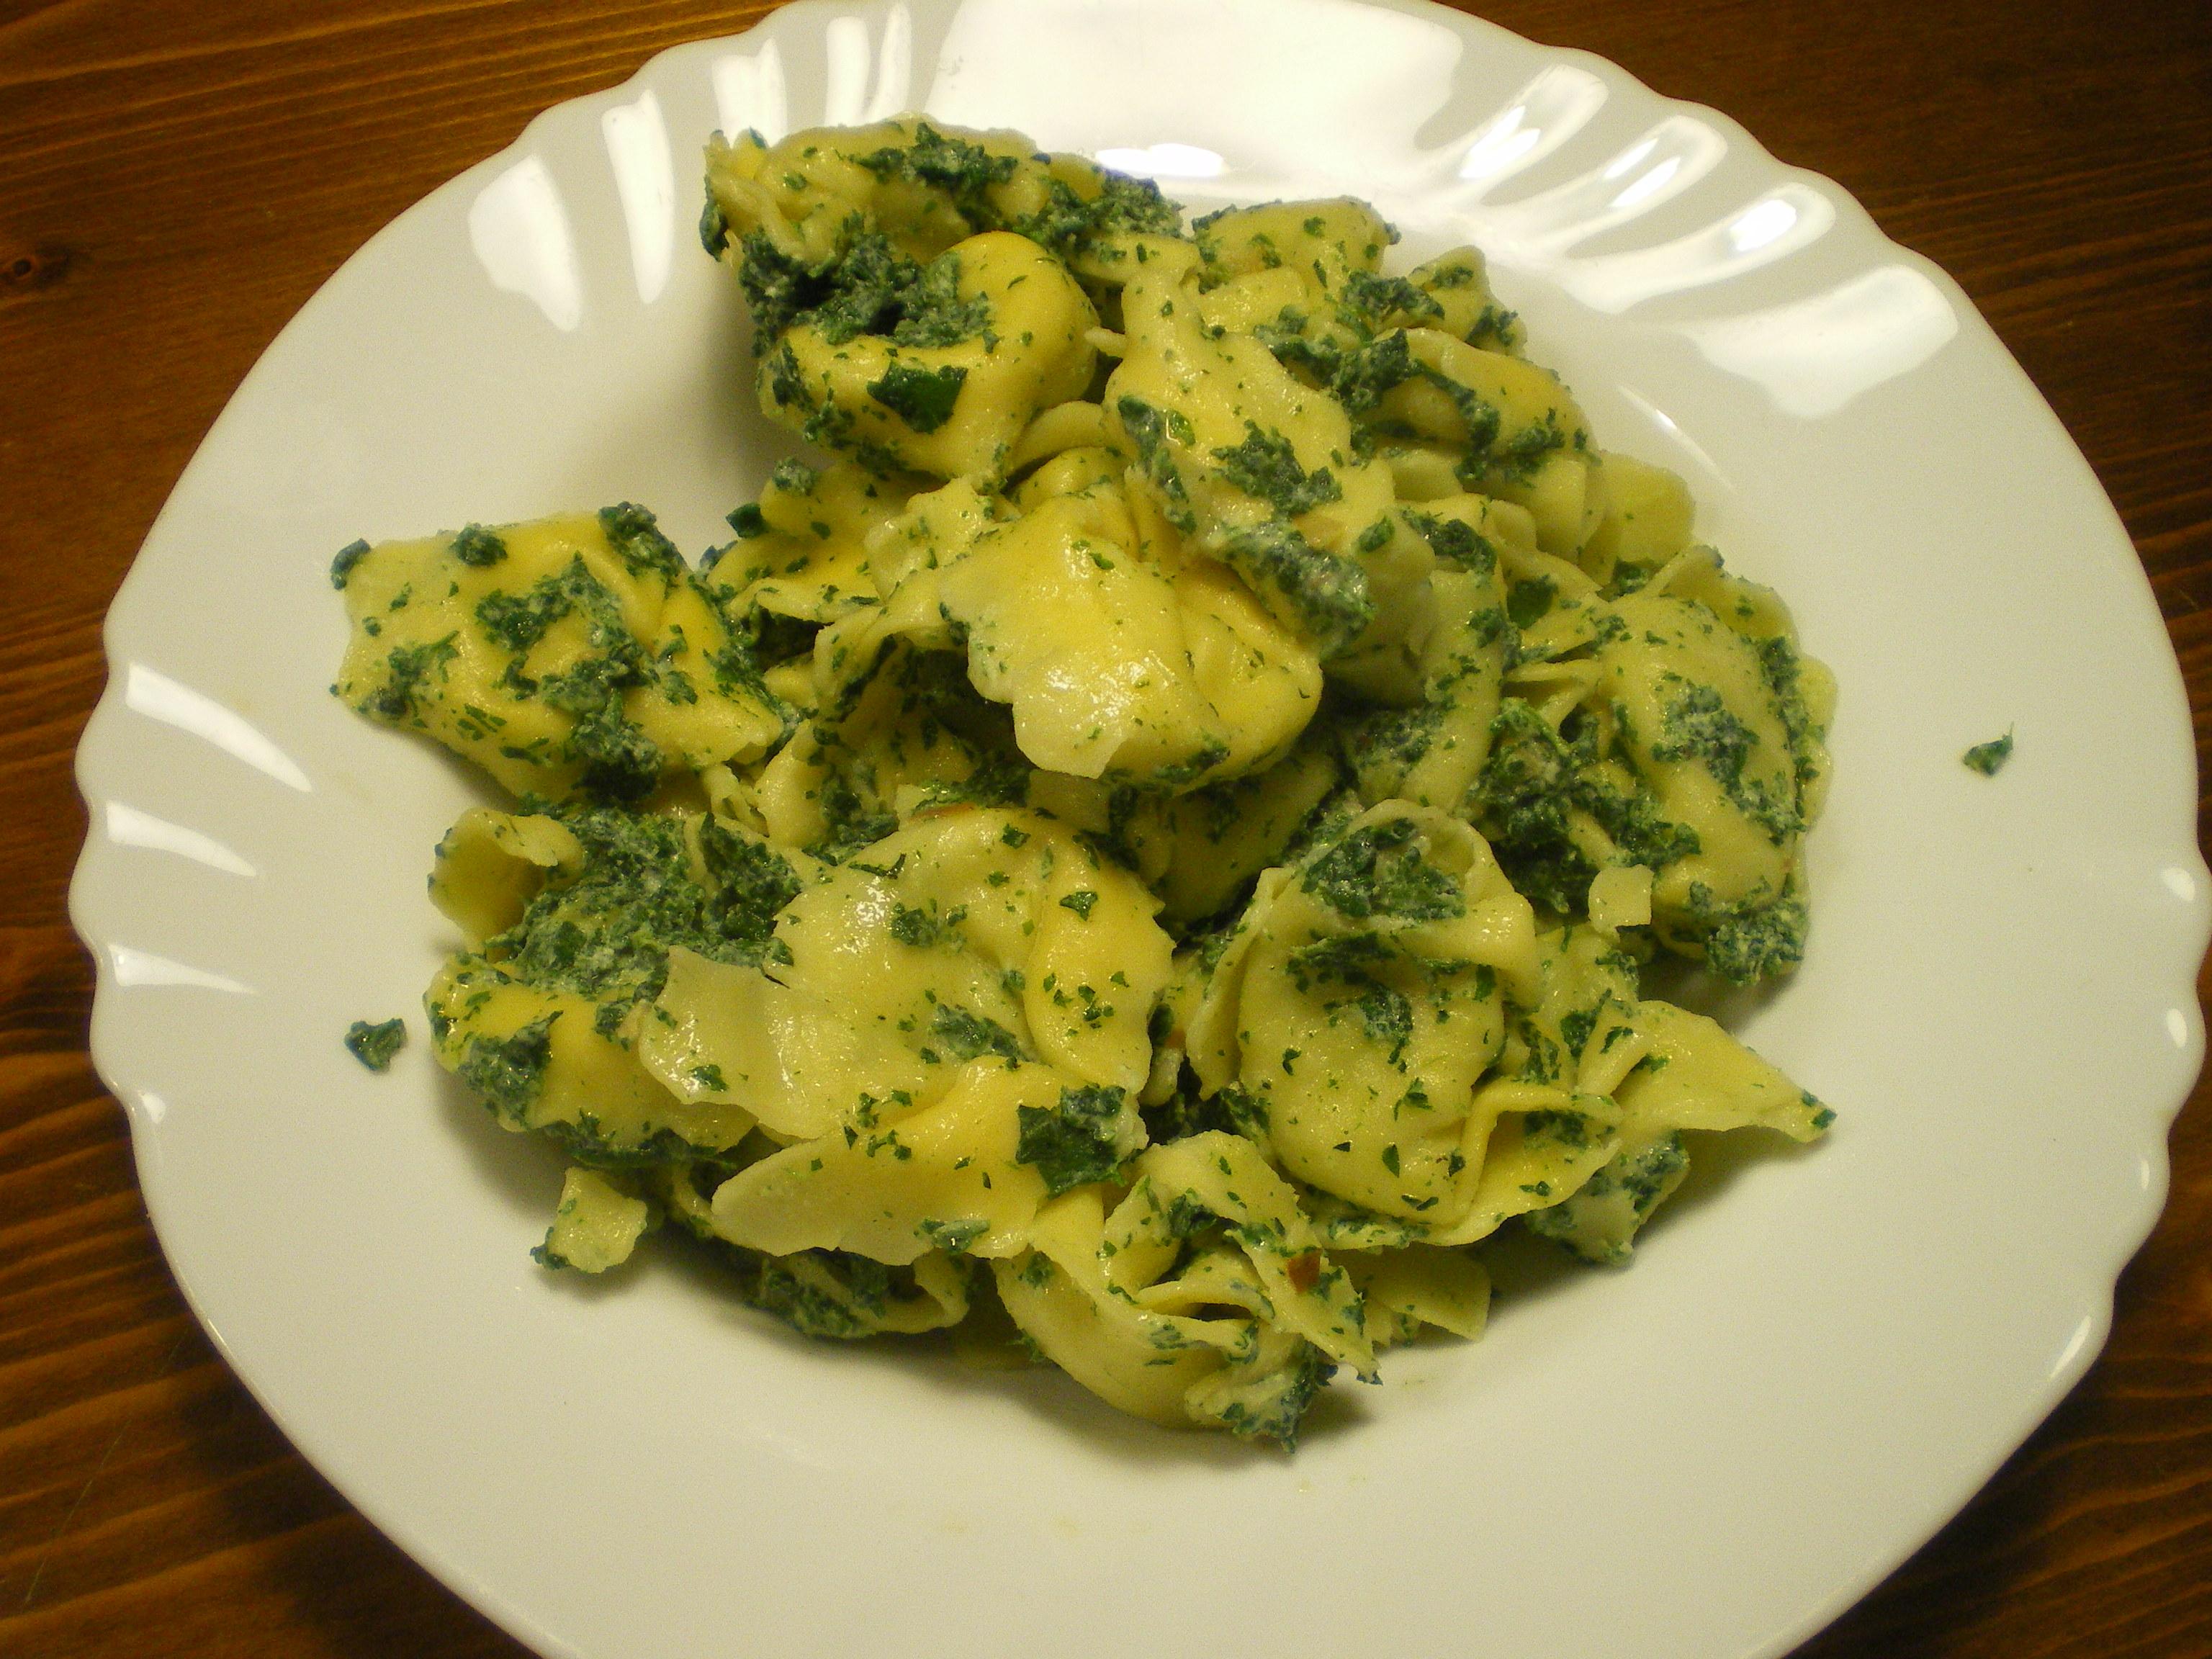 sbirciando in cucina | vilma - Ortiche In Cucina